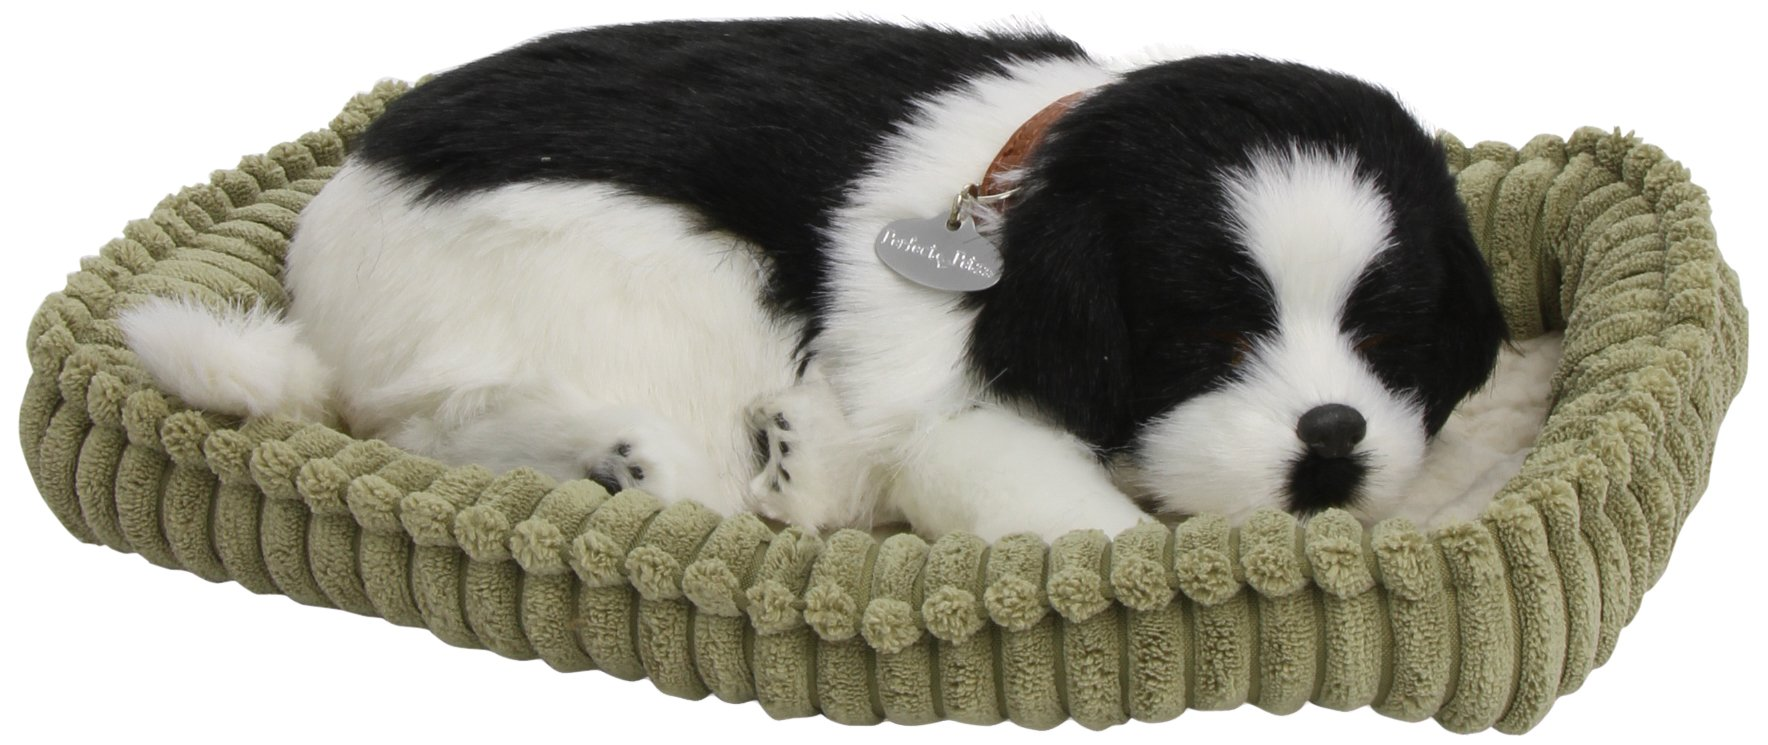 Border Collie – Pet Mate / Nap Breathing Life Like Sleeping Dog in Bed Sleeping Pet